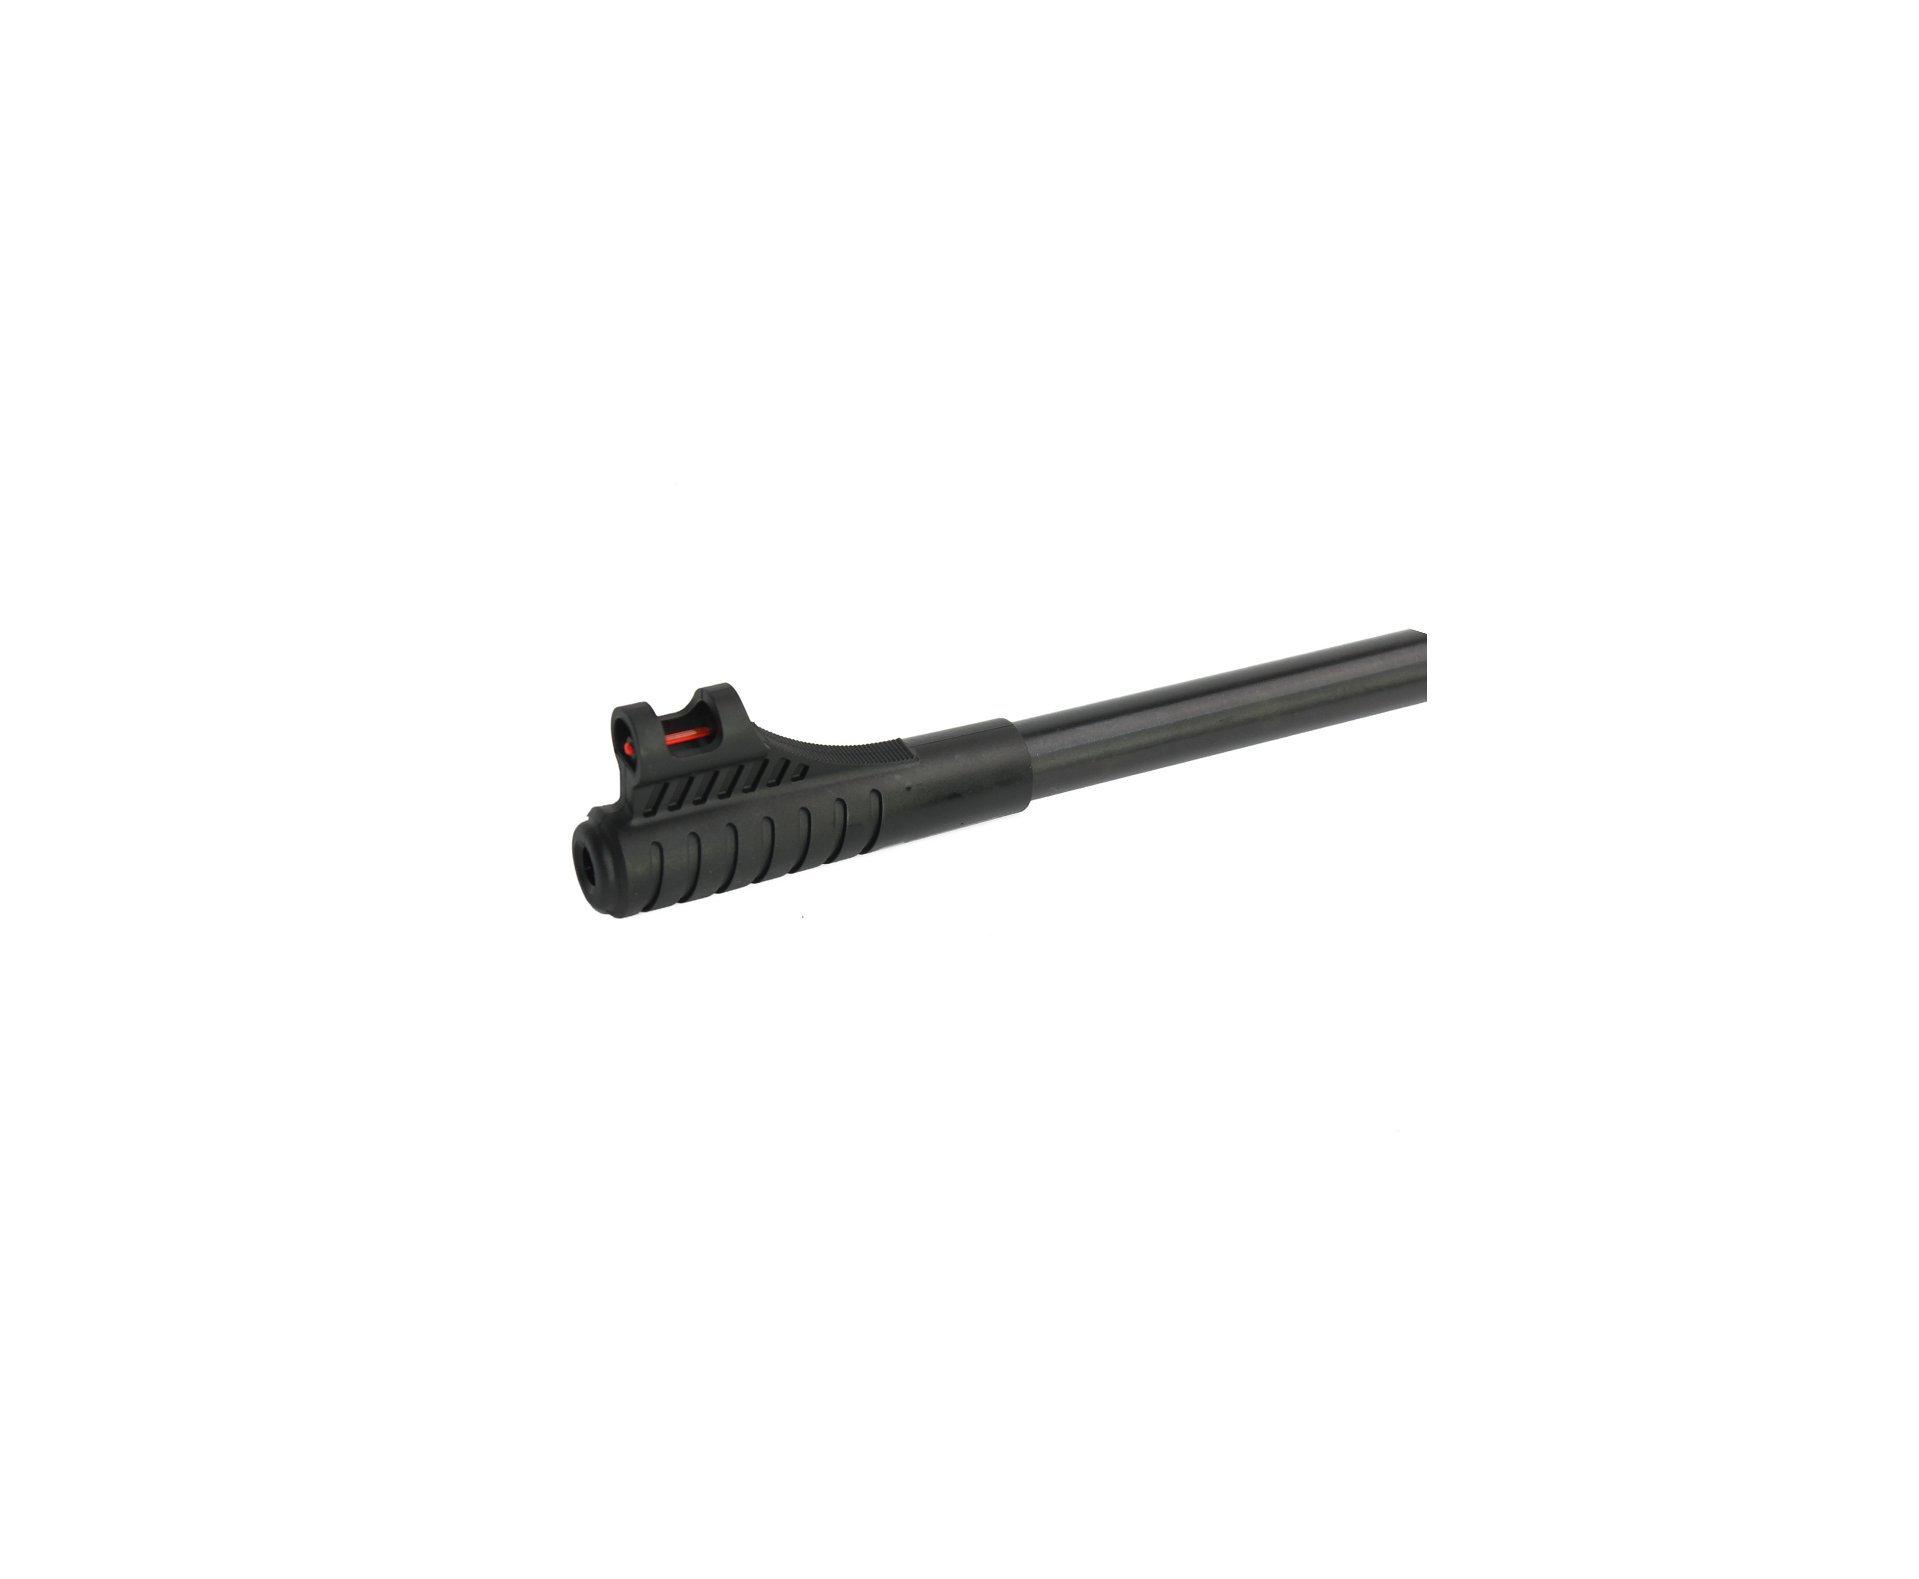 Carabina De Pressão Qgk Black Diamond 5,5mm